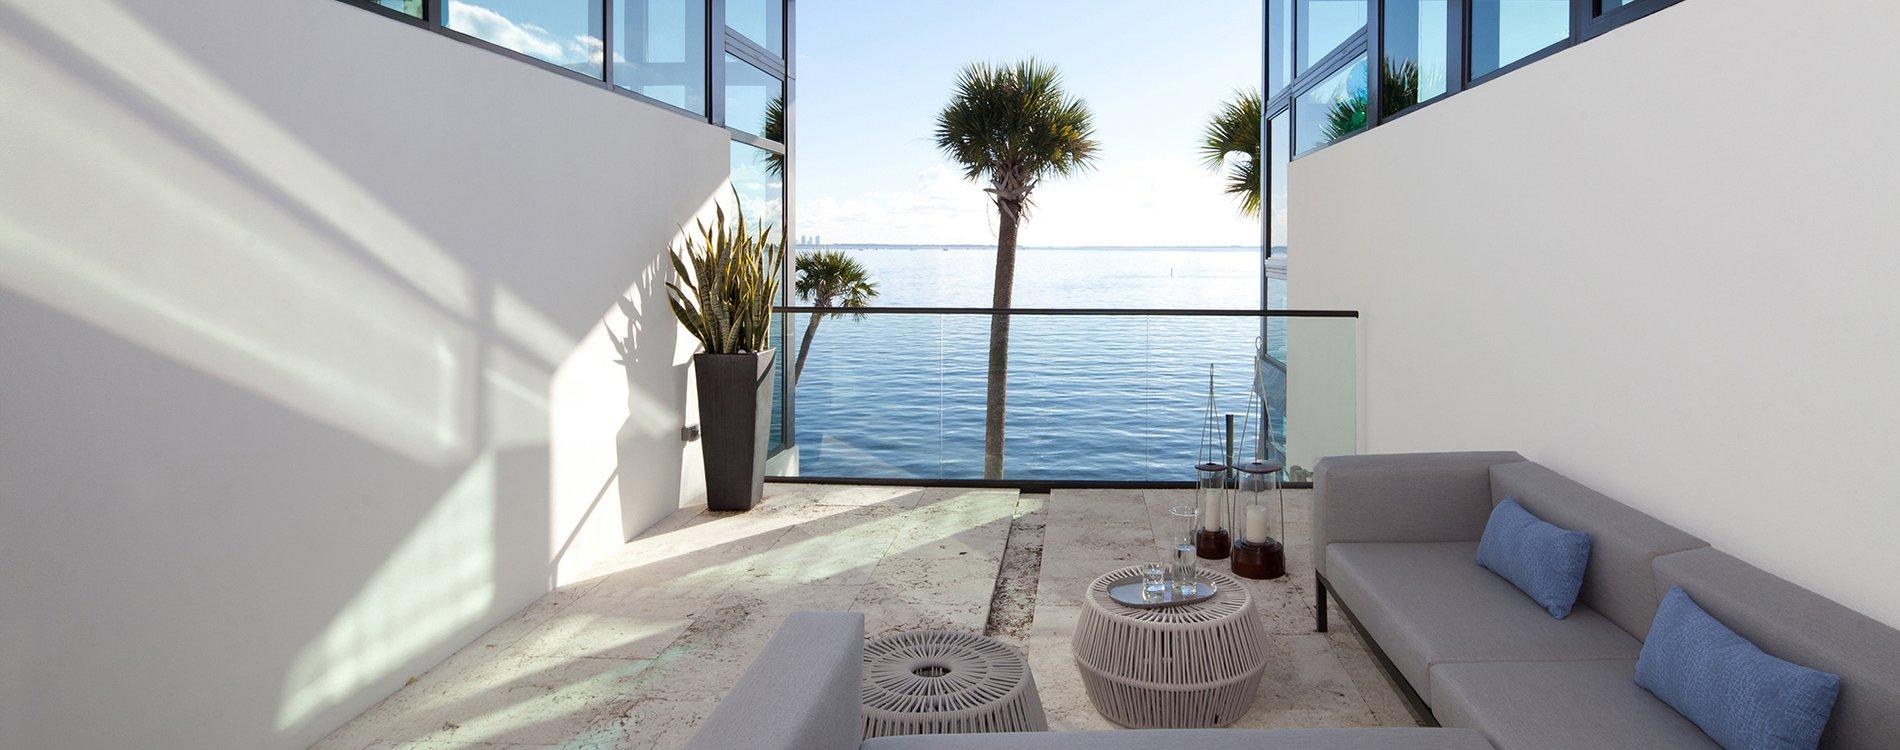 Touzet Studio diseña una casa en Coral Gables que rompe moldes